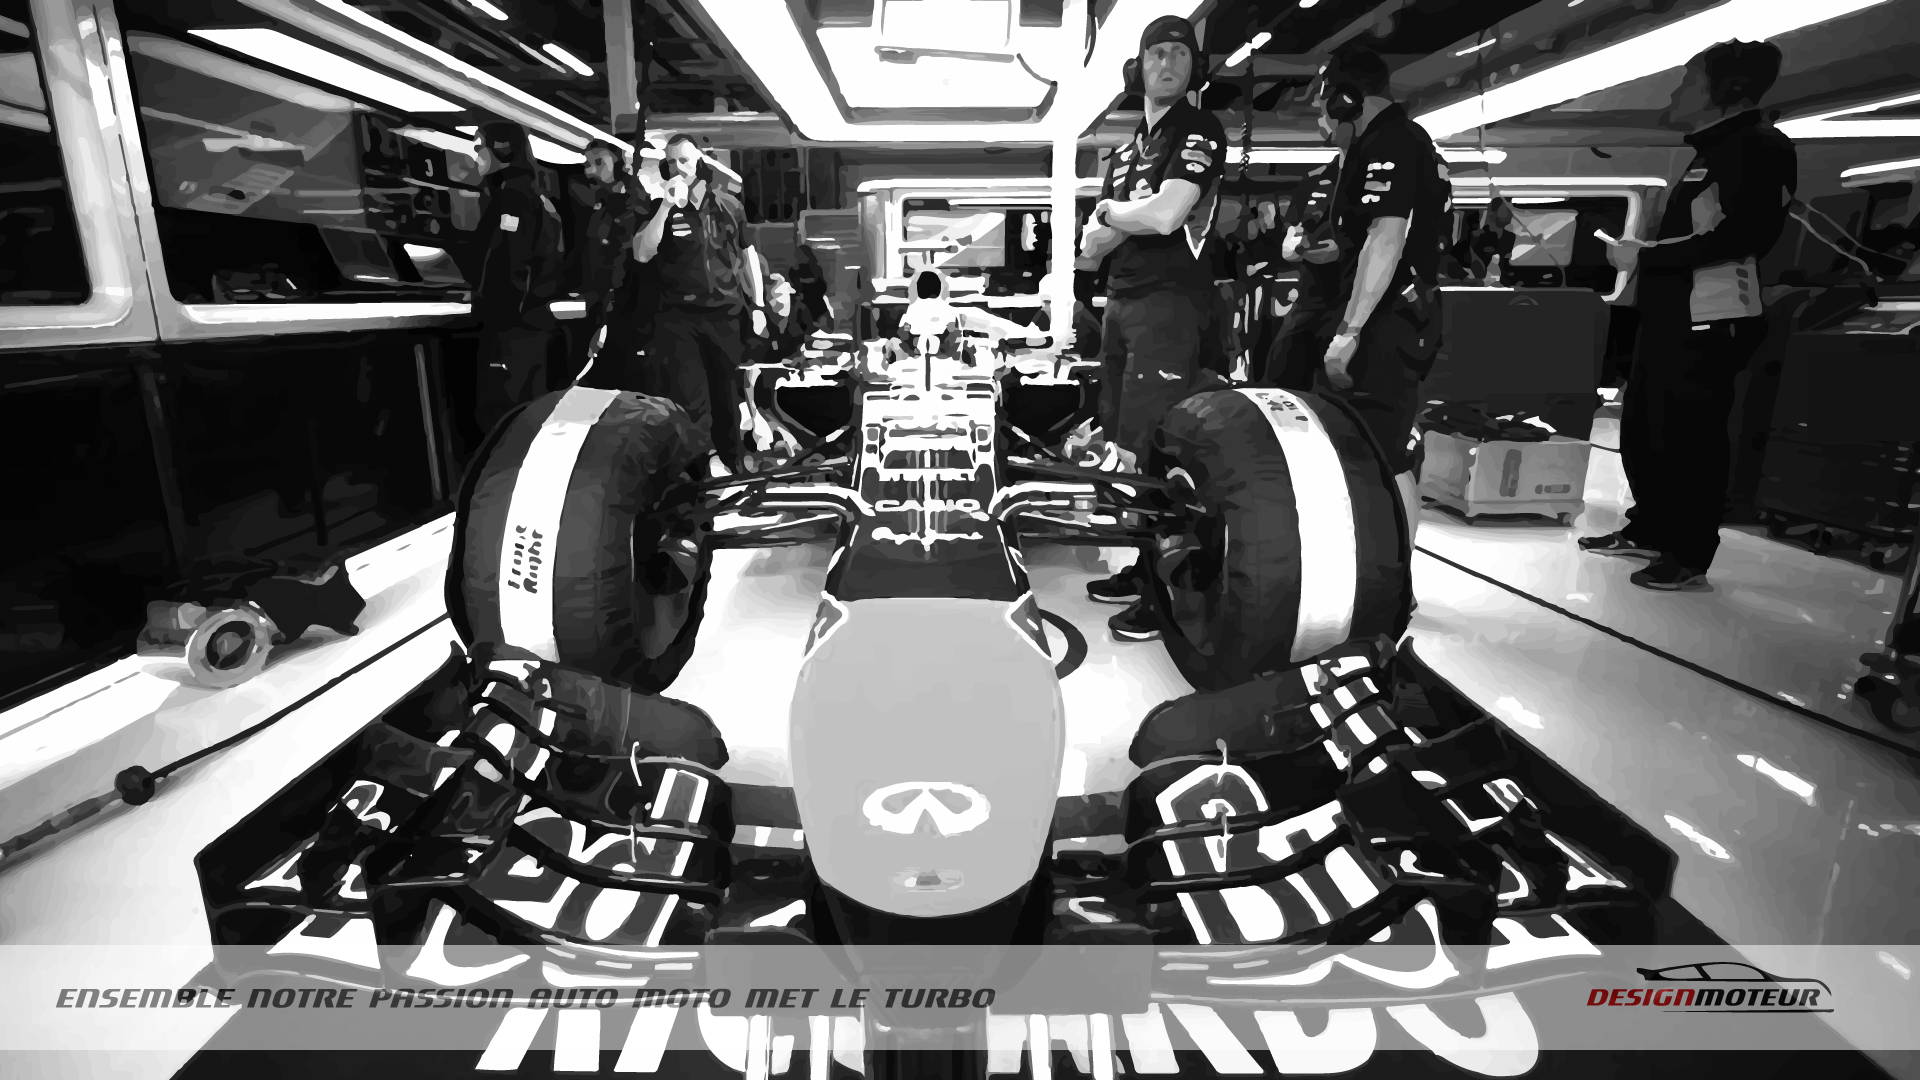 Wallpaper DESIGNMOTEUR 2015 – F1